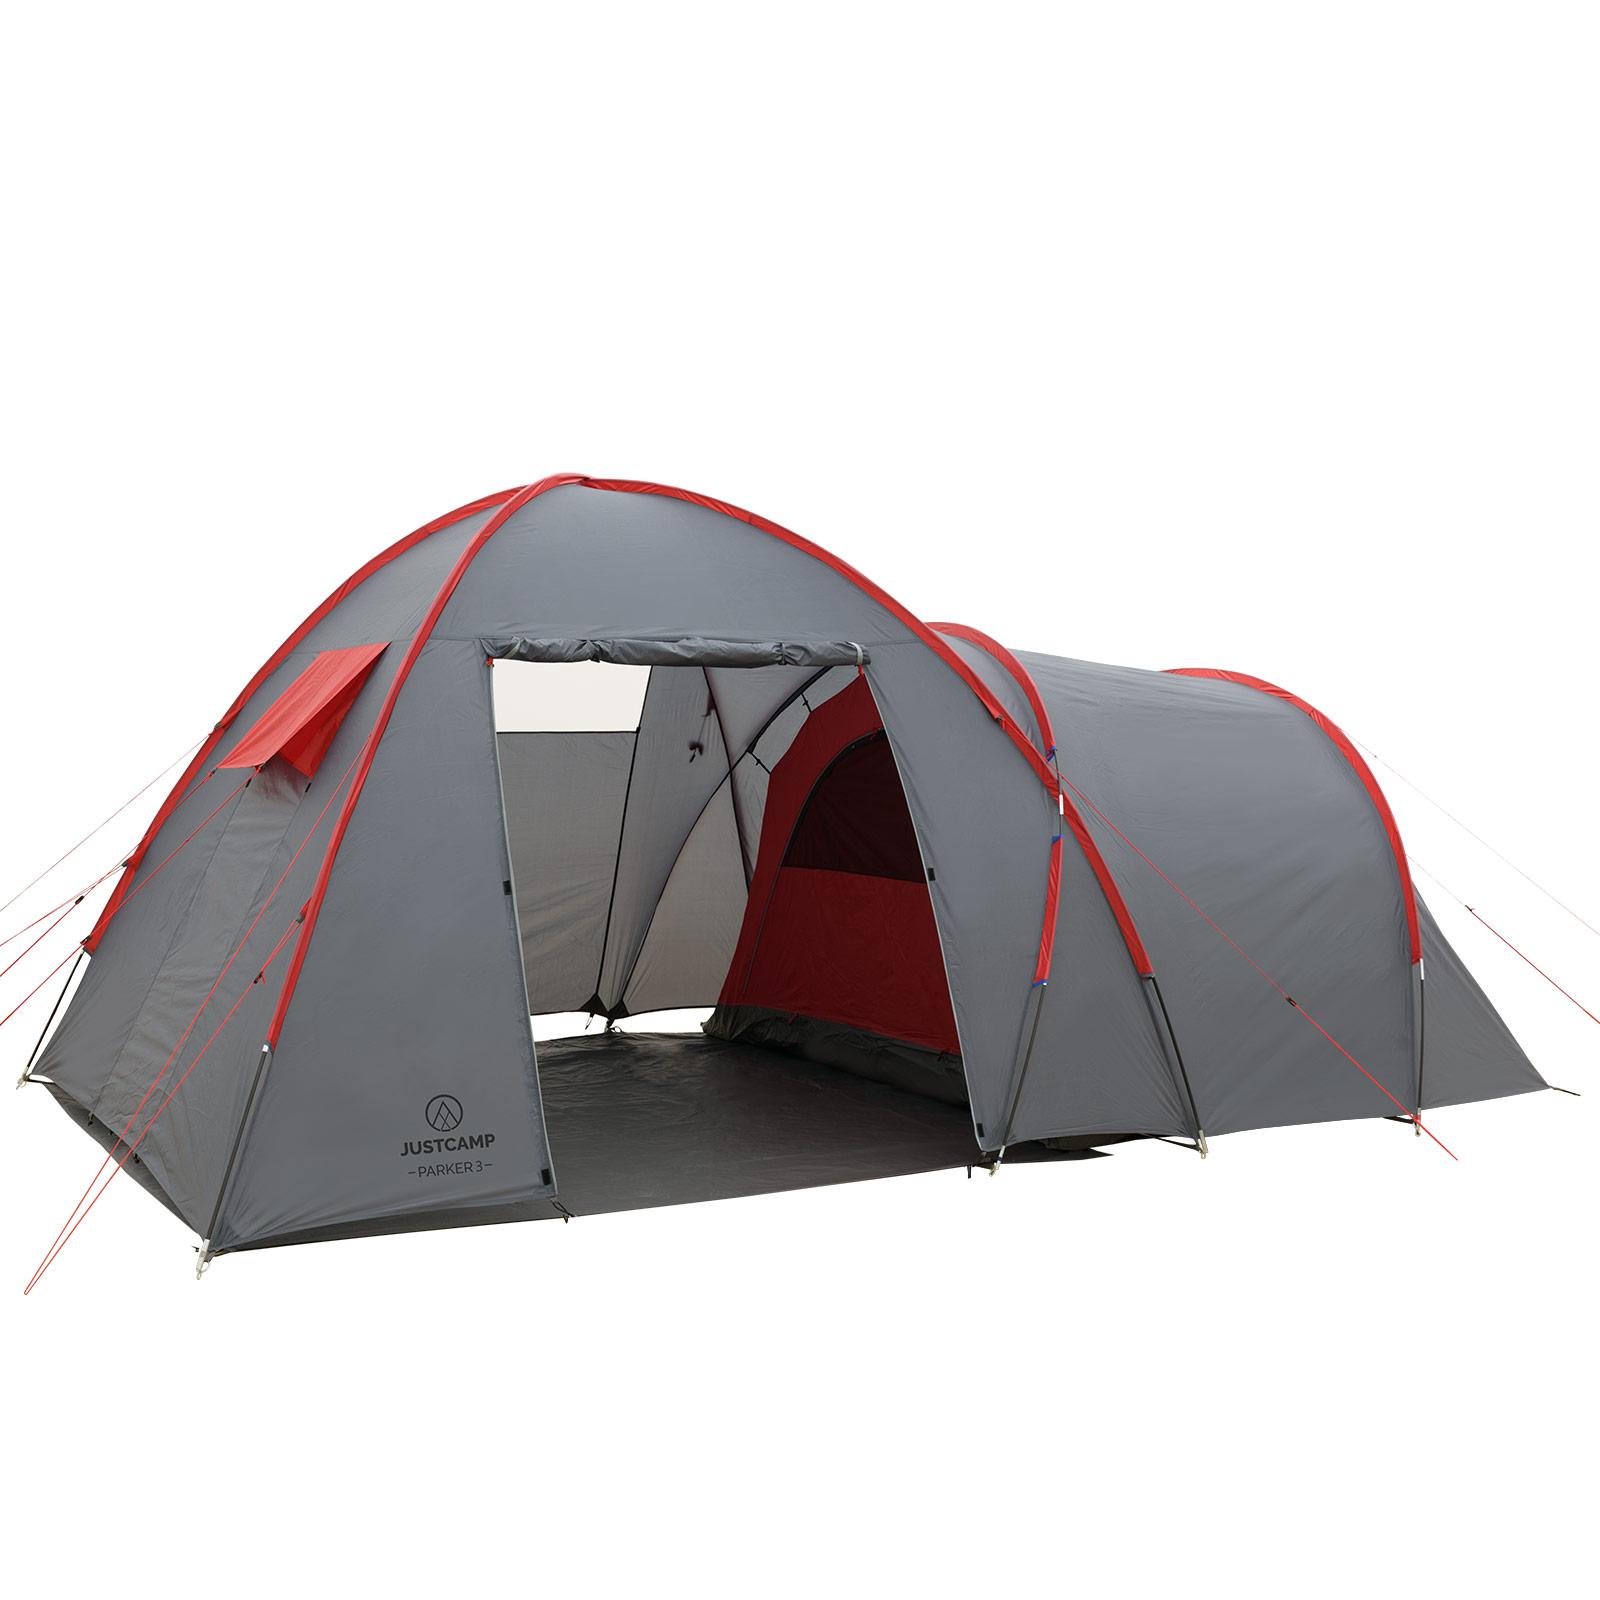 Zelt Kaufen In Holland : Zelt mit stehhöhe justcamp parker familienzelt